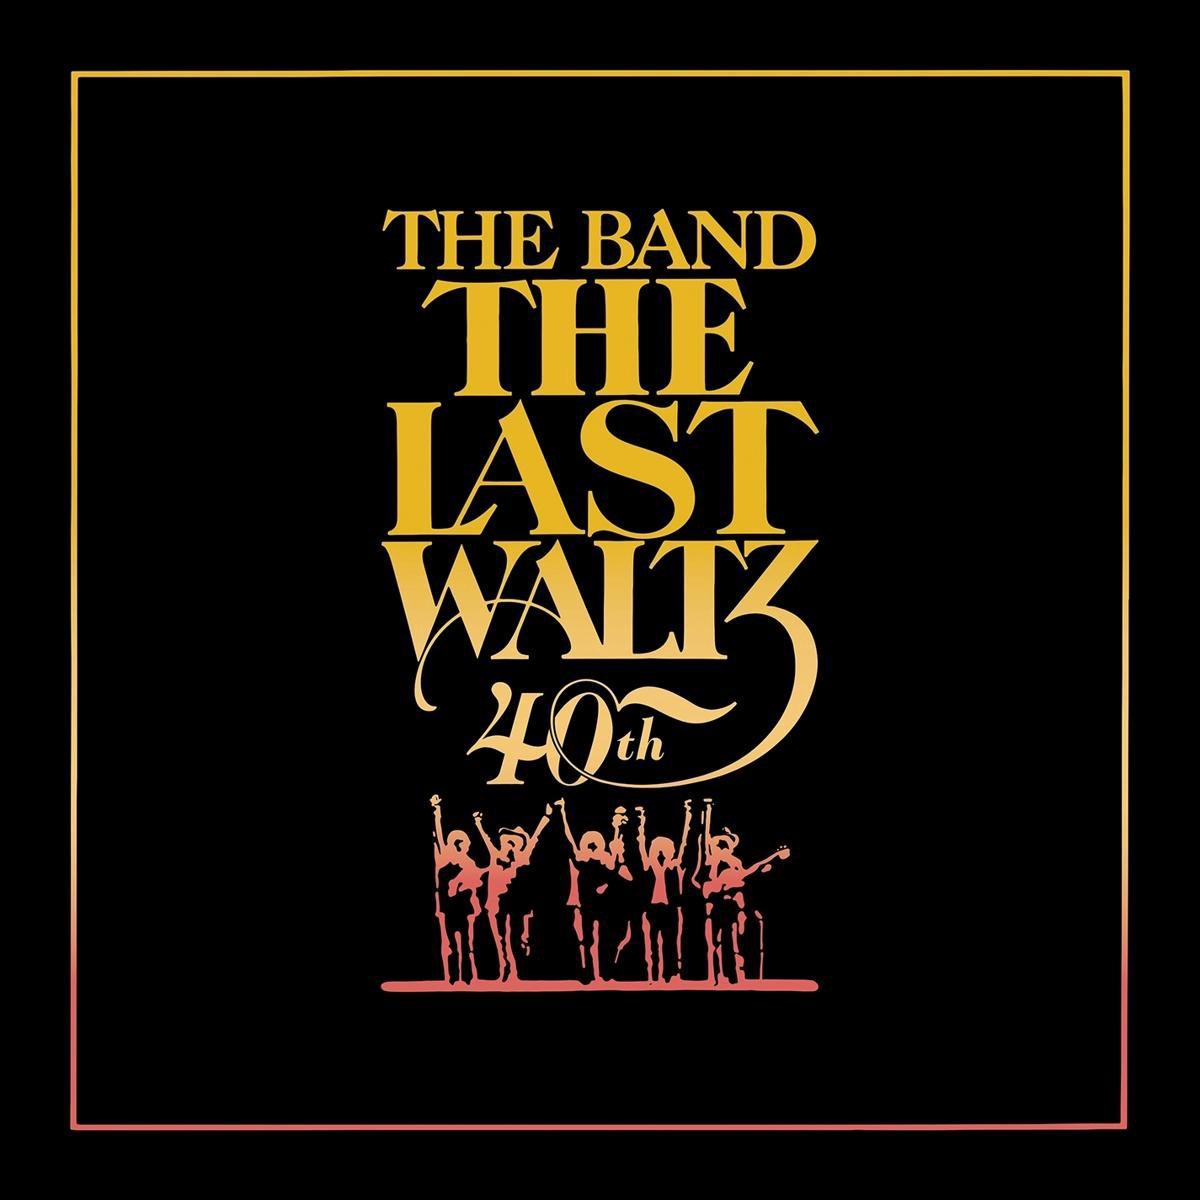 The Last Waltz 40th Anniversary 4CD + Blu-Ray - The Band